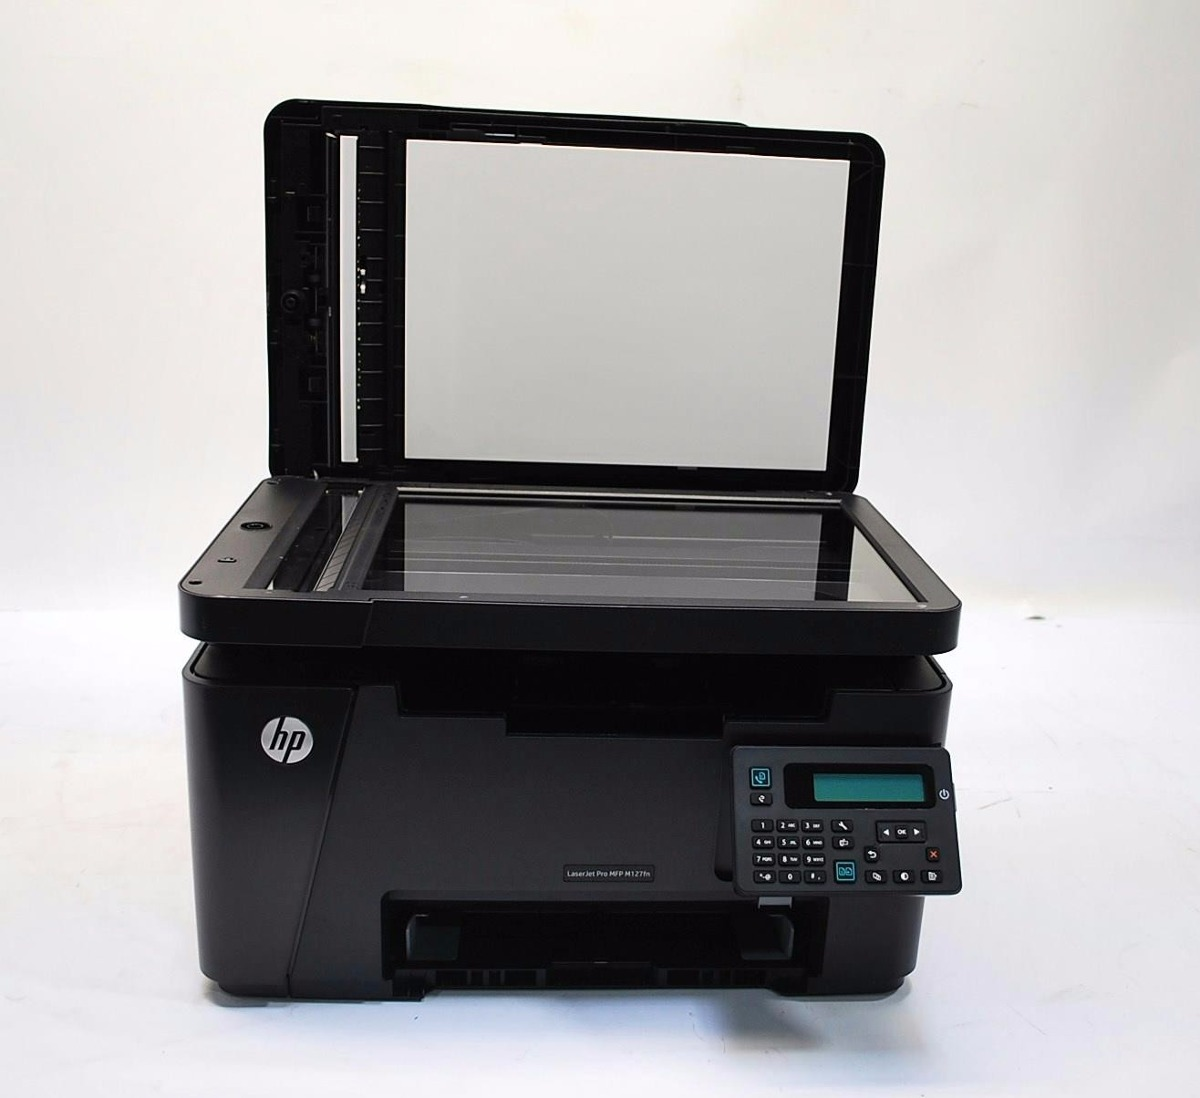 Multifuncional Hp Laserjet Pro M127fn 600dpi Mono Red ...